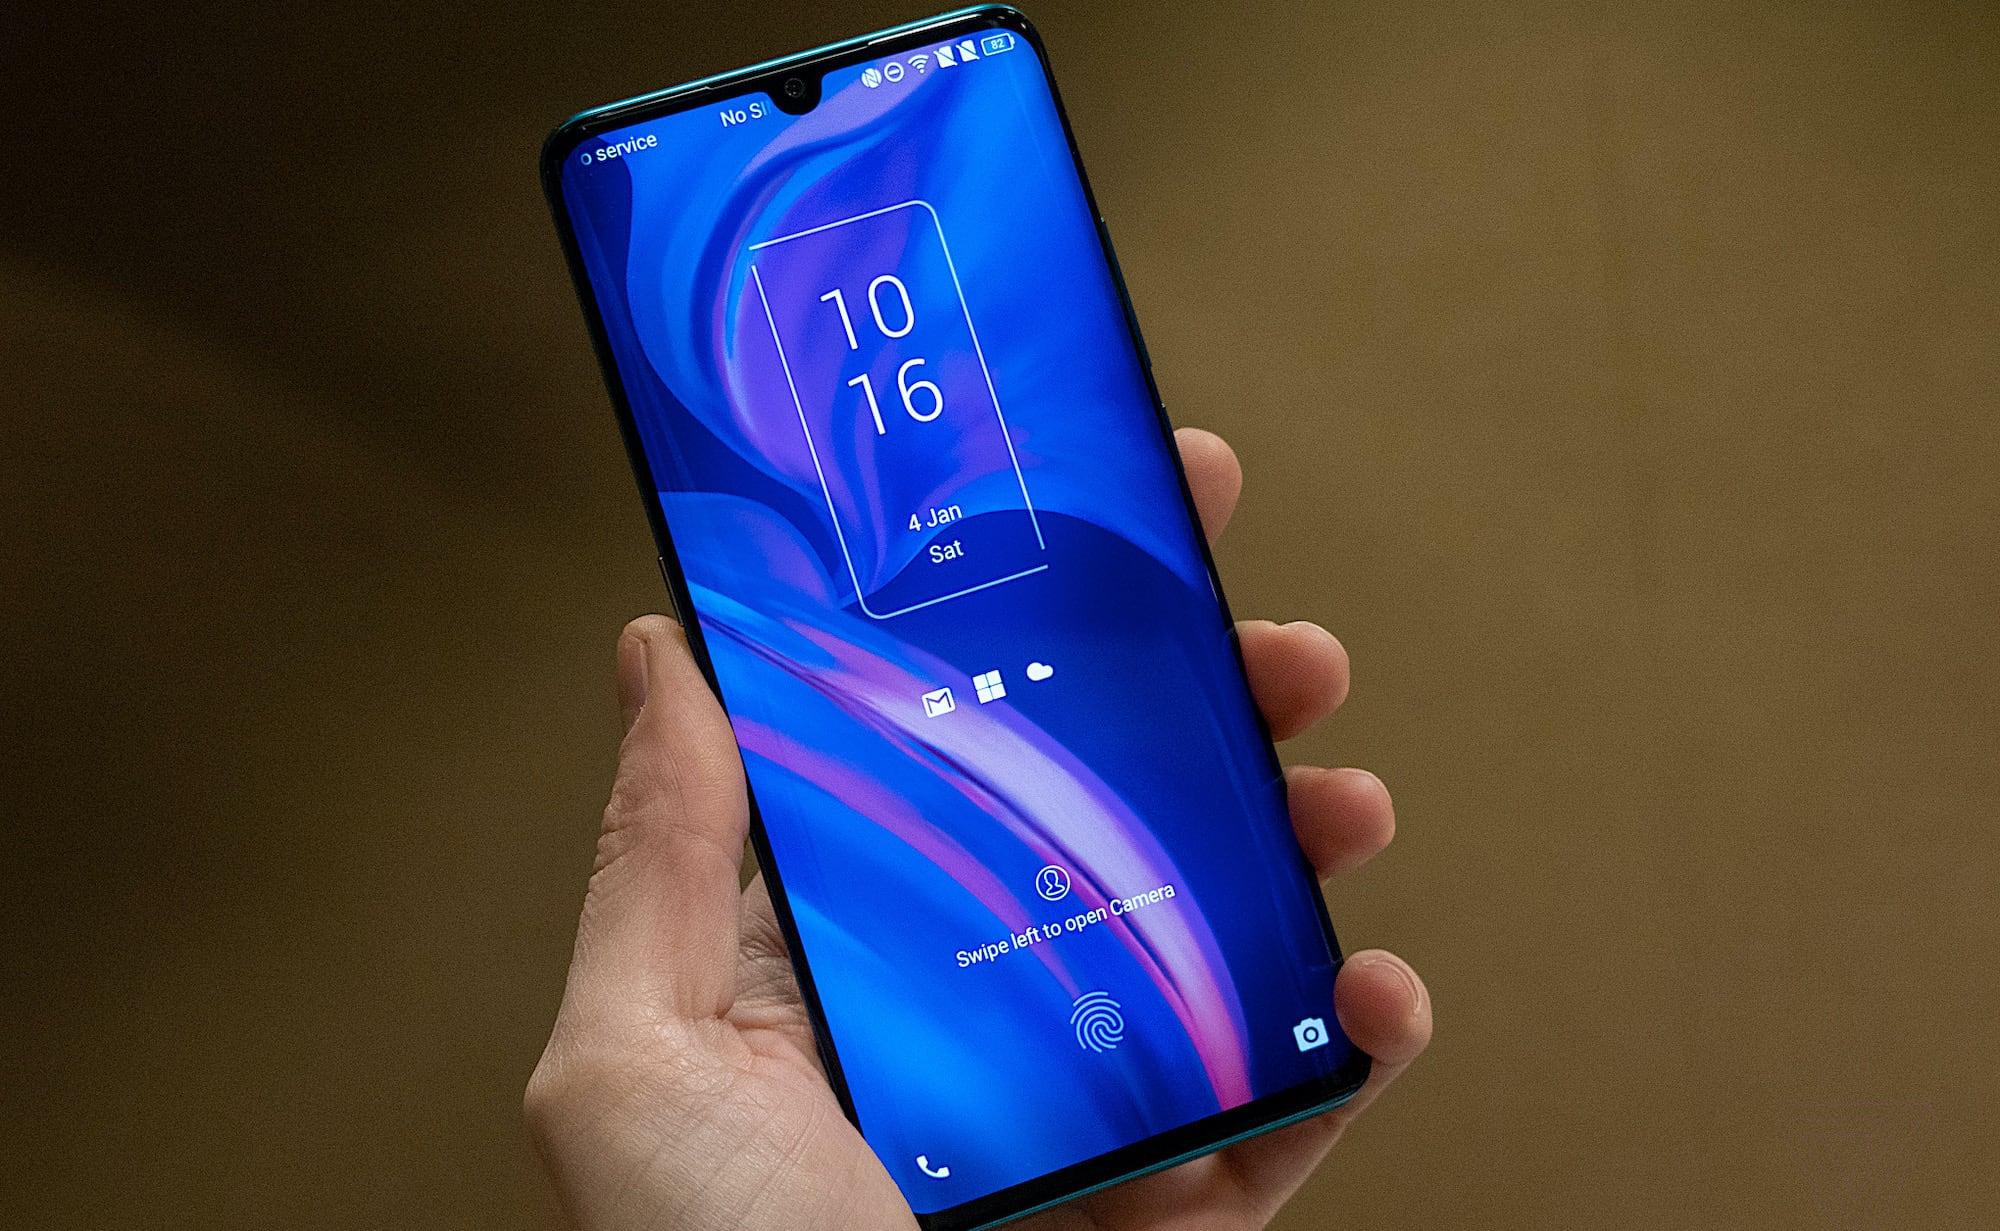 TCL 10 Pro, 10L, & 10 5G Sleek Smartphones has a fingerprint sensor on the screen